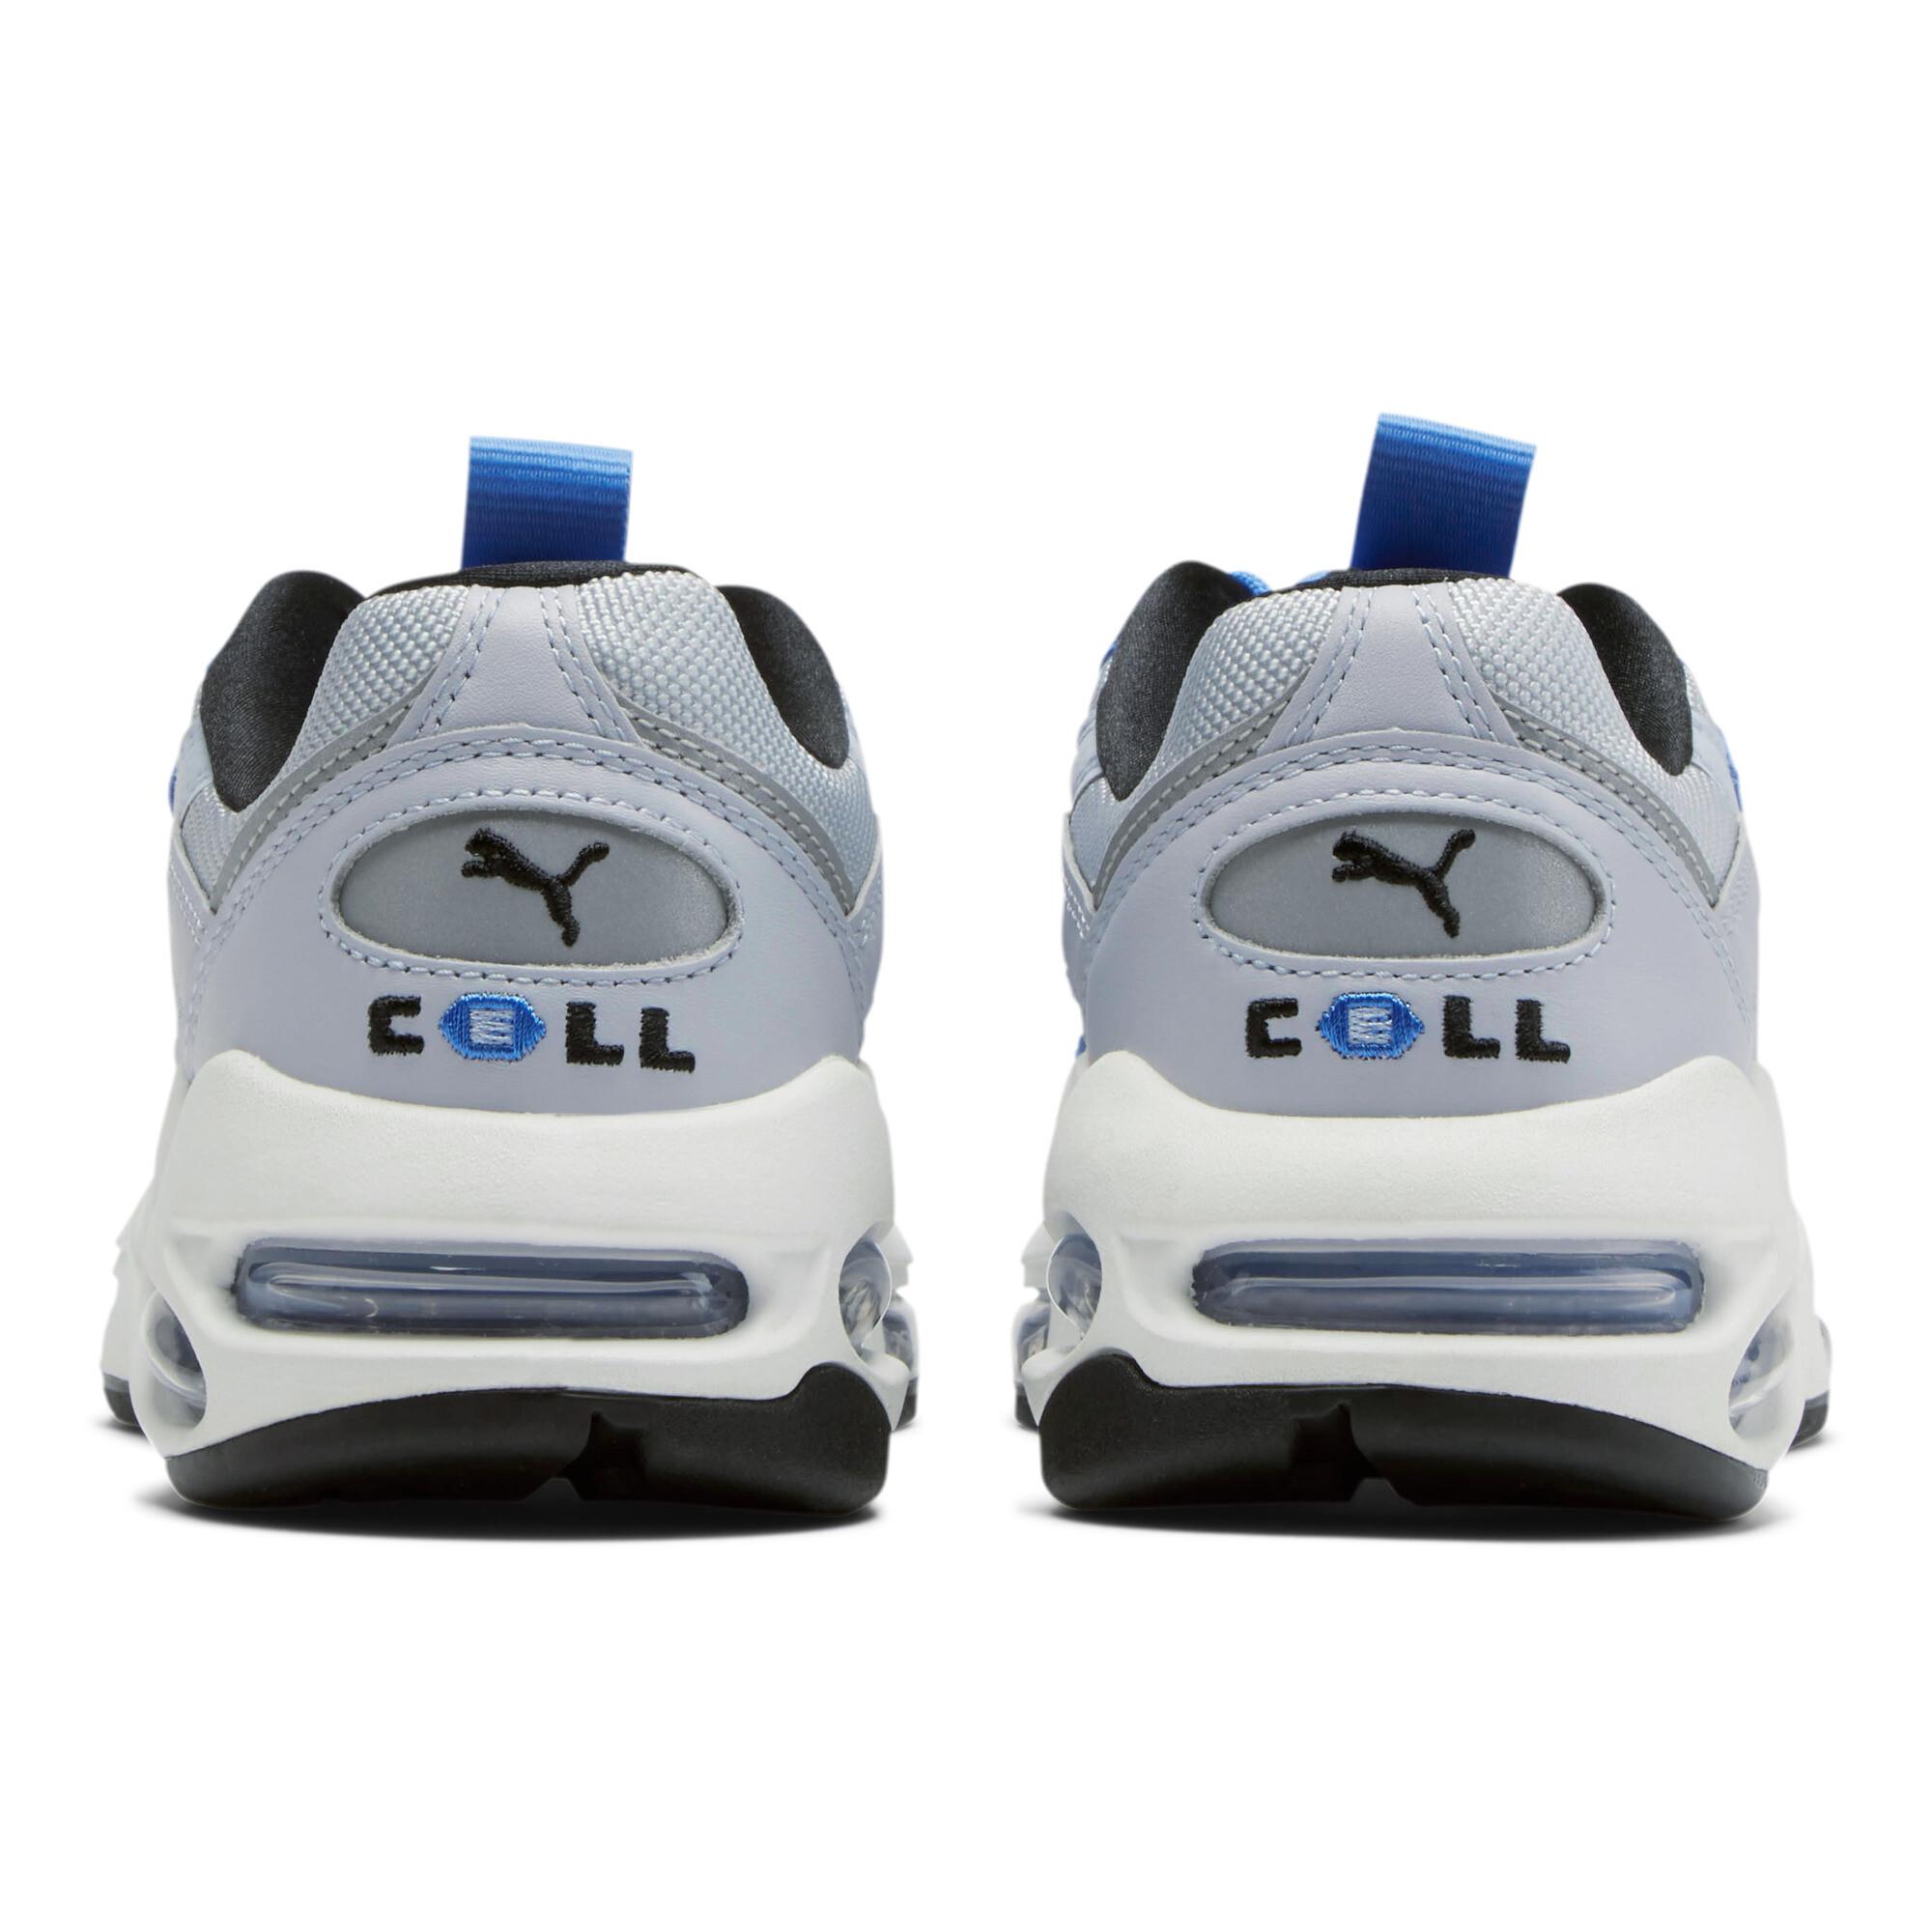 PUMA-CELL-Endura-Rebound-Women-039-s-Sneakers-Women-Shoe-Sport-Classics thumbnail 3